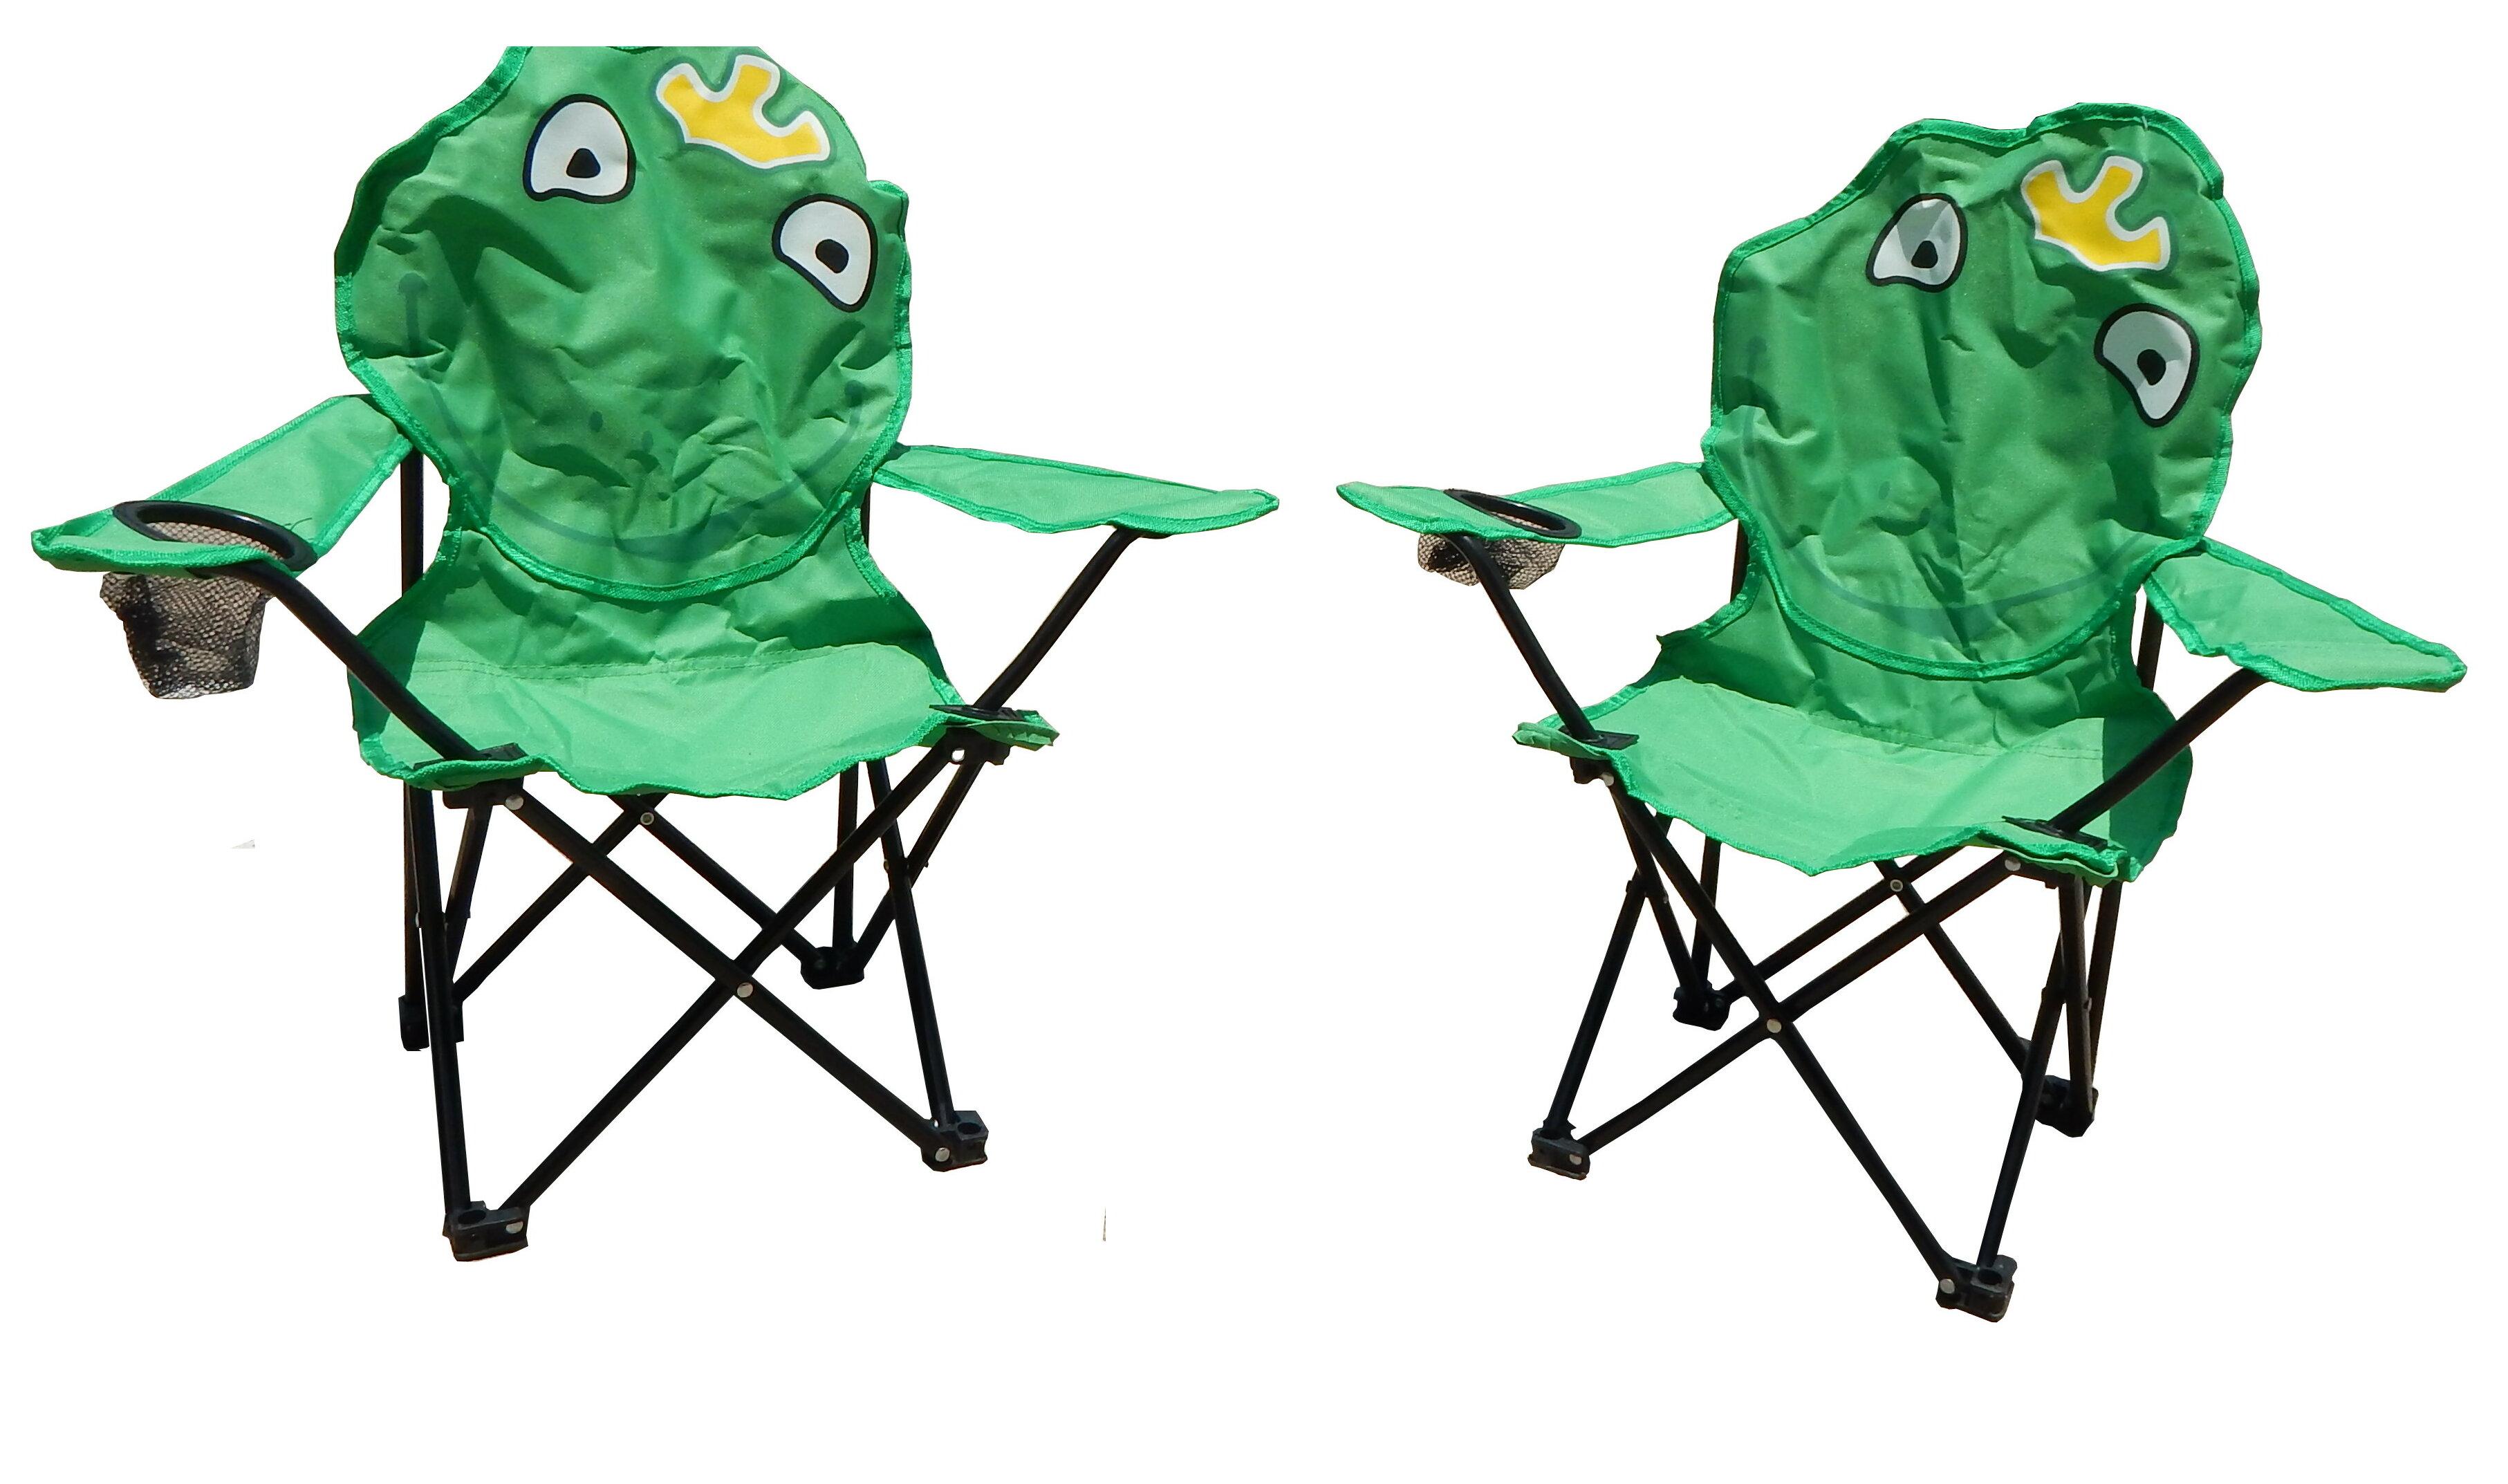 Zoomie Kids Skyler Frog Folding Kids Beach Chair With Cup Holder